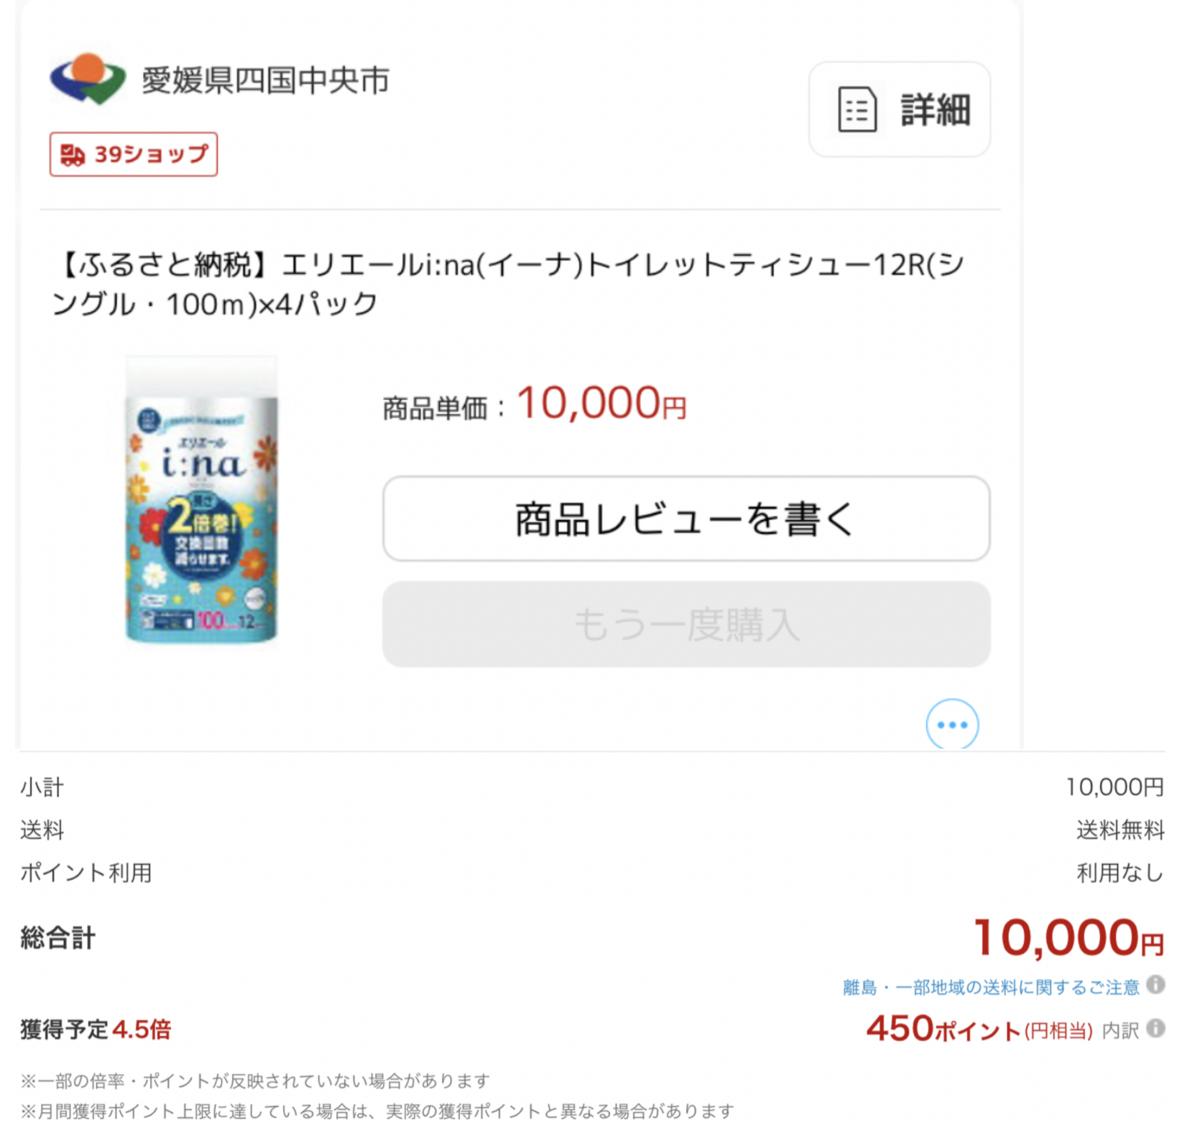 f:id:tanakanayuta:20210612021327p:plain